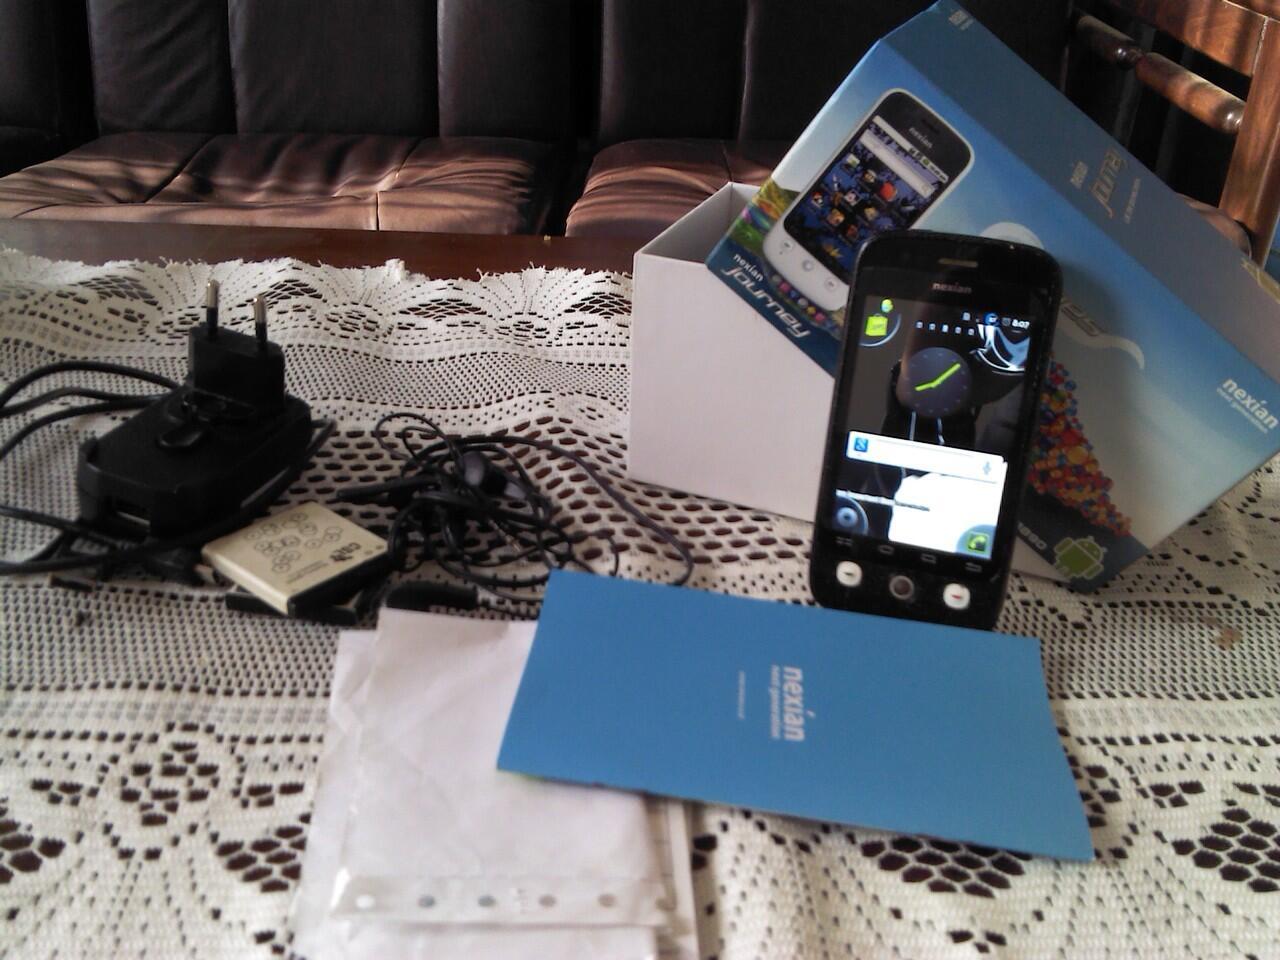 Jual android Nexian Journey a890 Hitam Metalik 600k COD BANDUNG